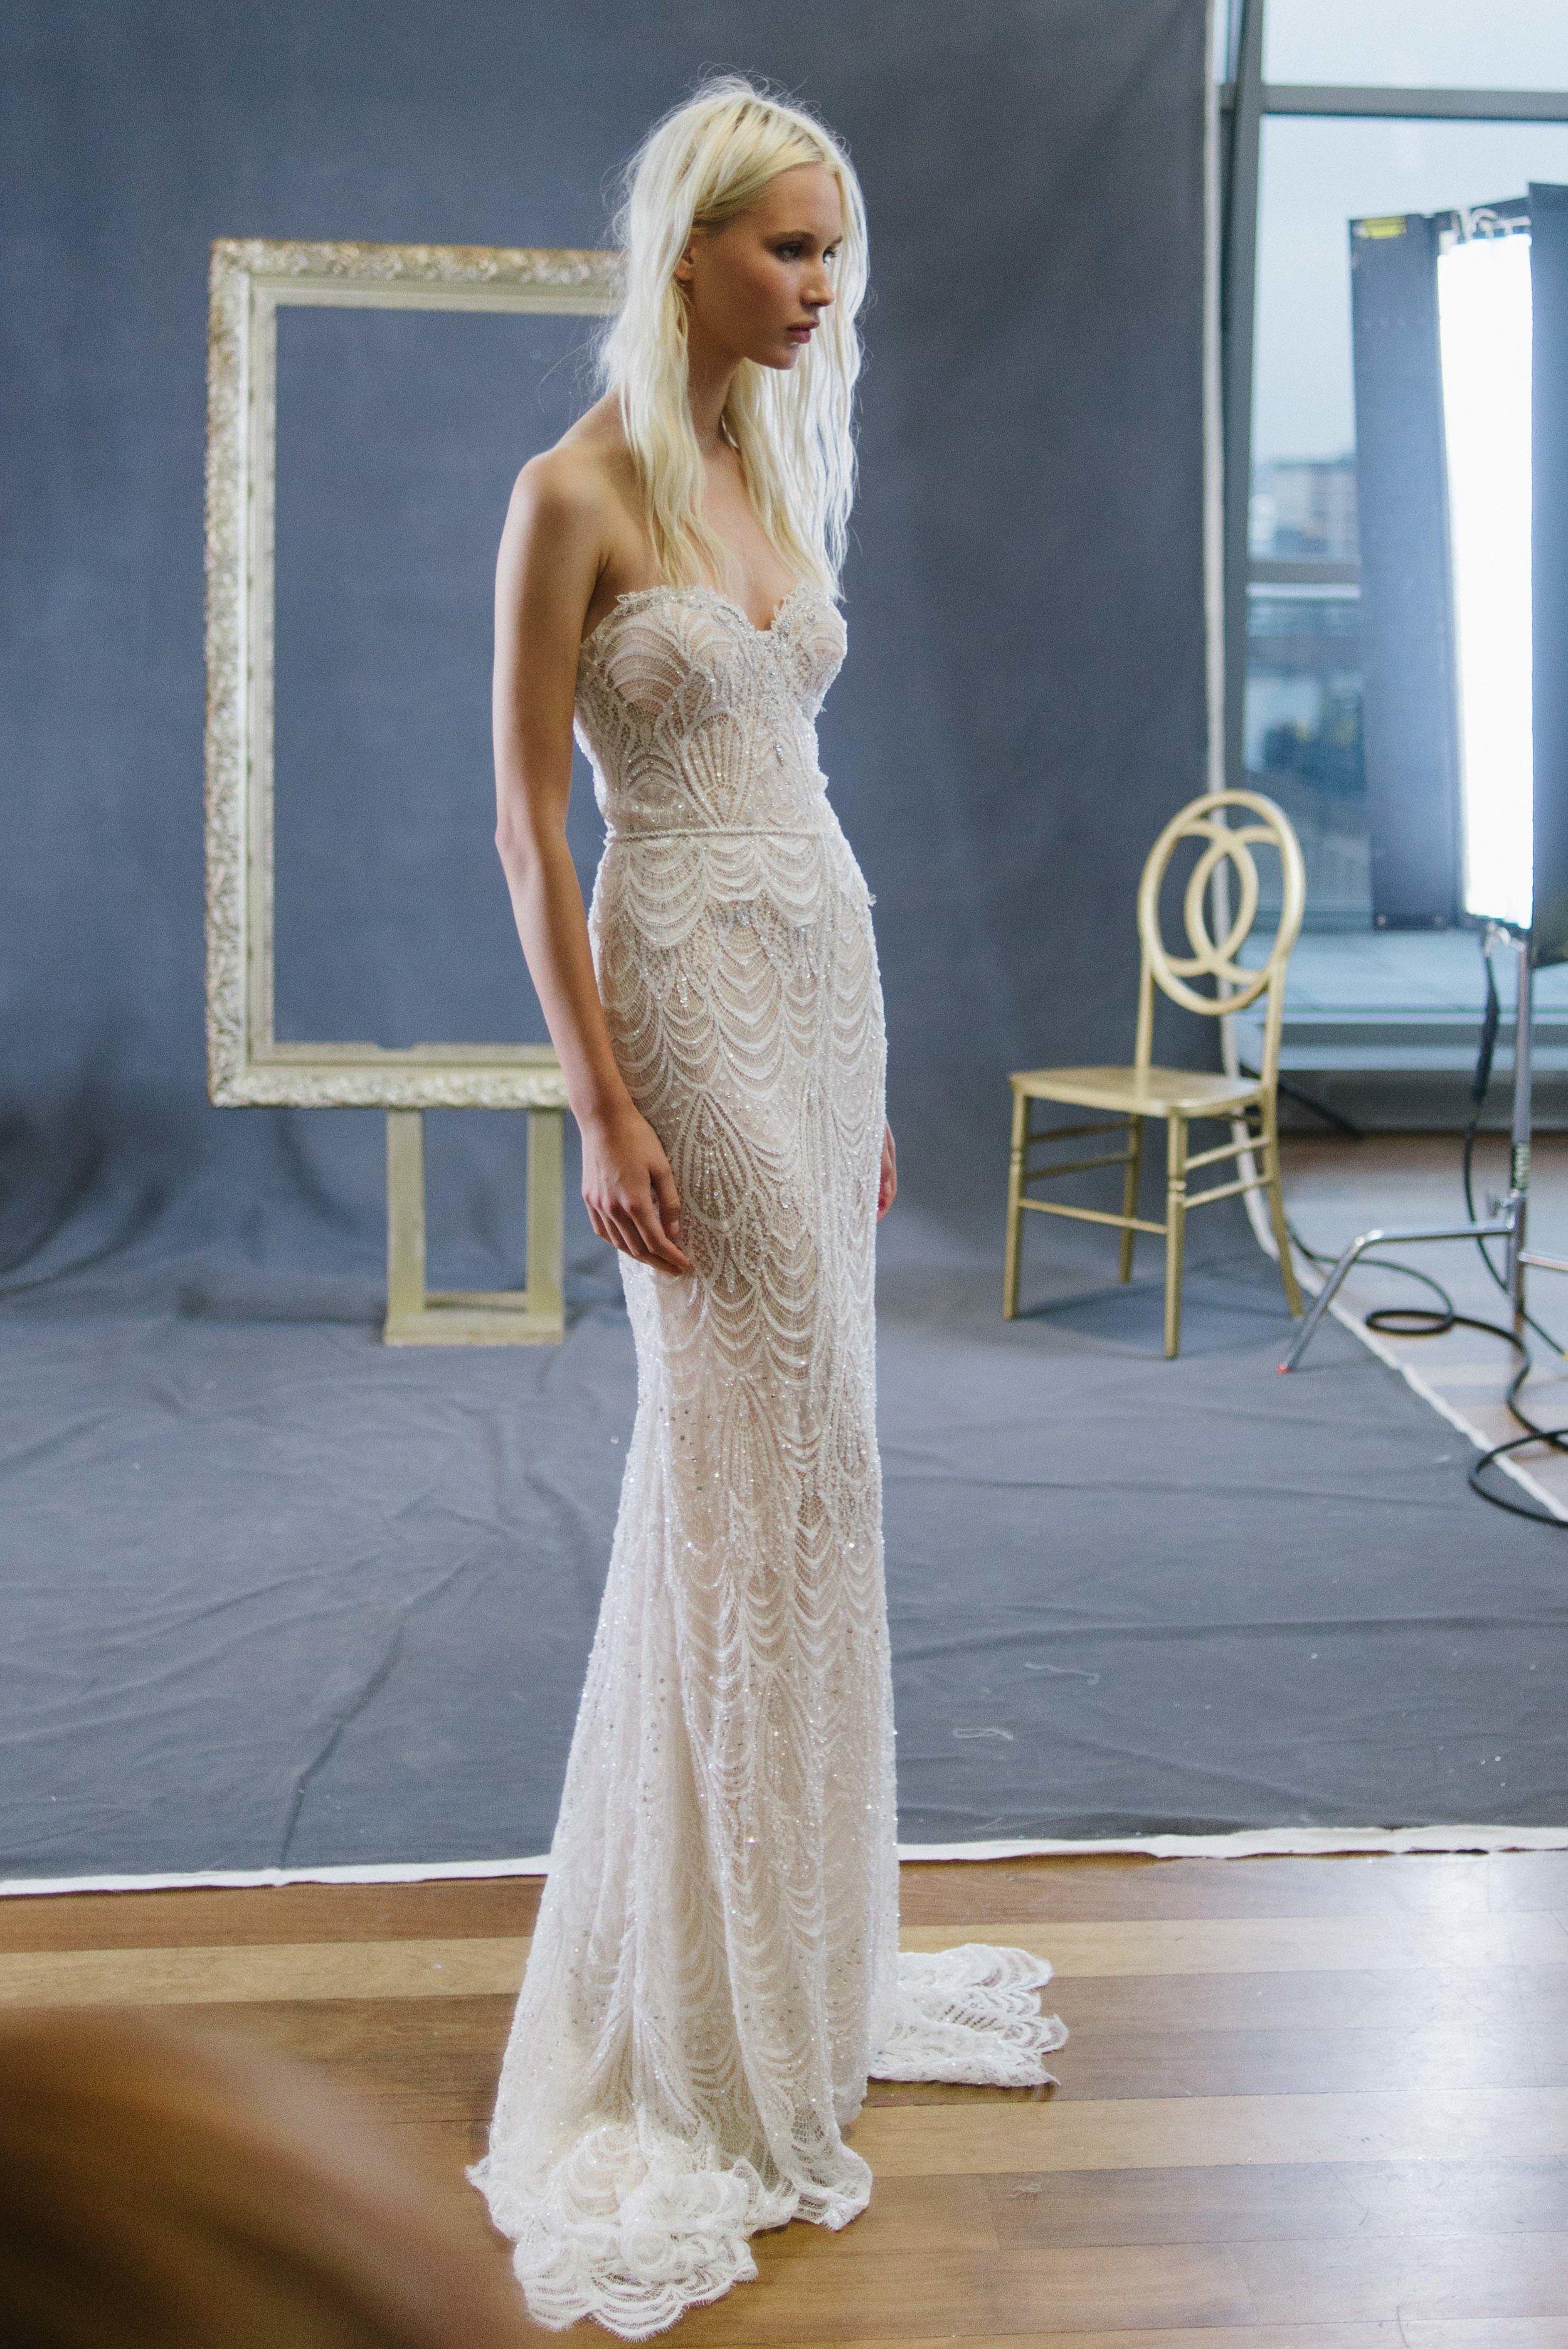 New York Bridal Fashion Week 2016 | Galia Lahav | Little White Dress Bridal Shop in Denver